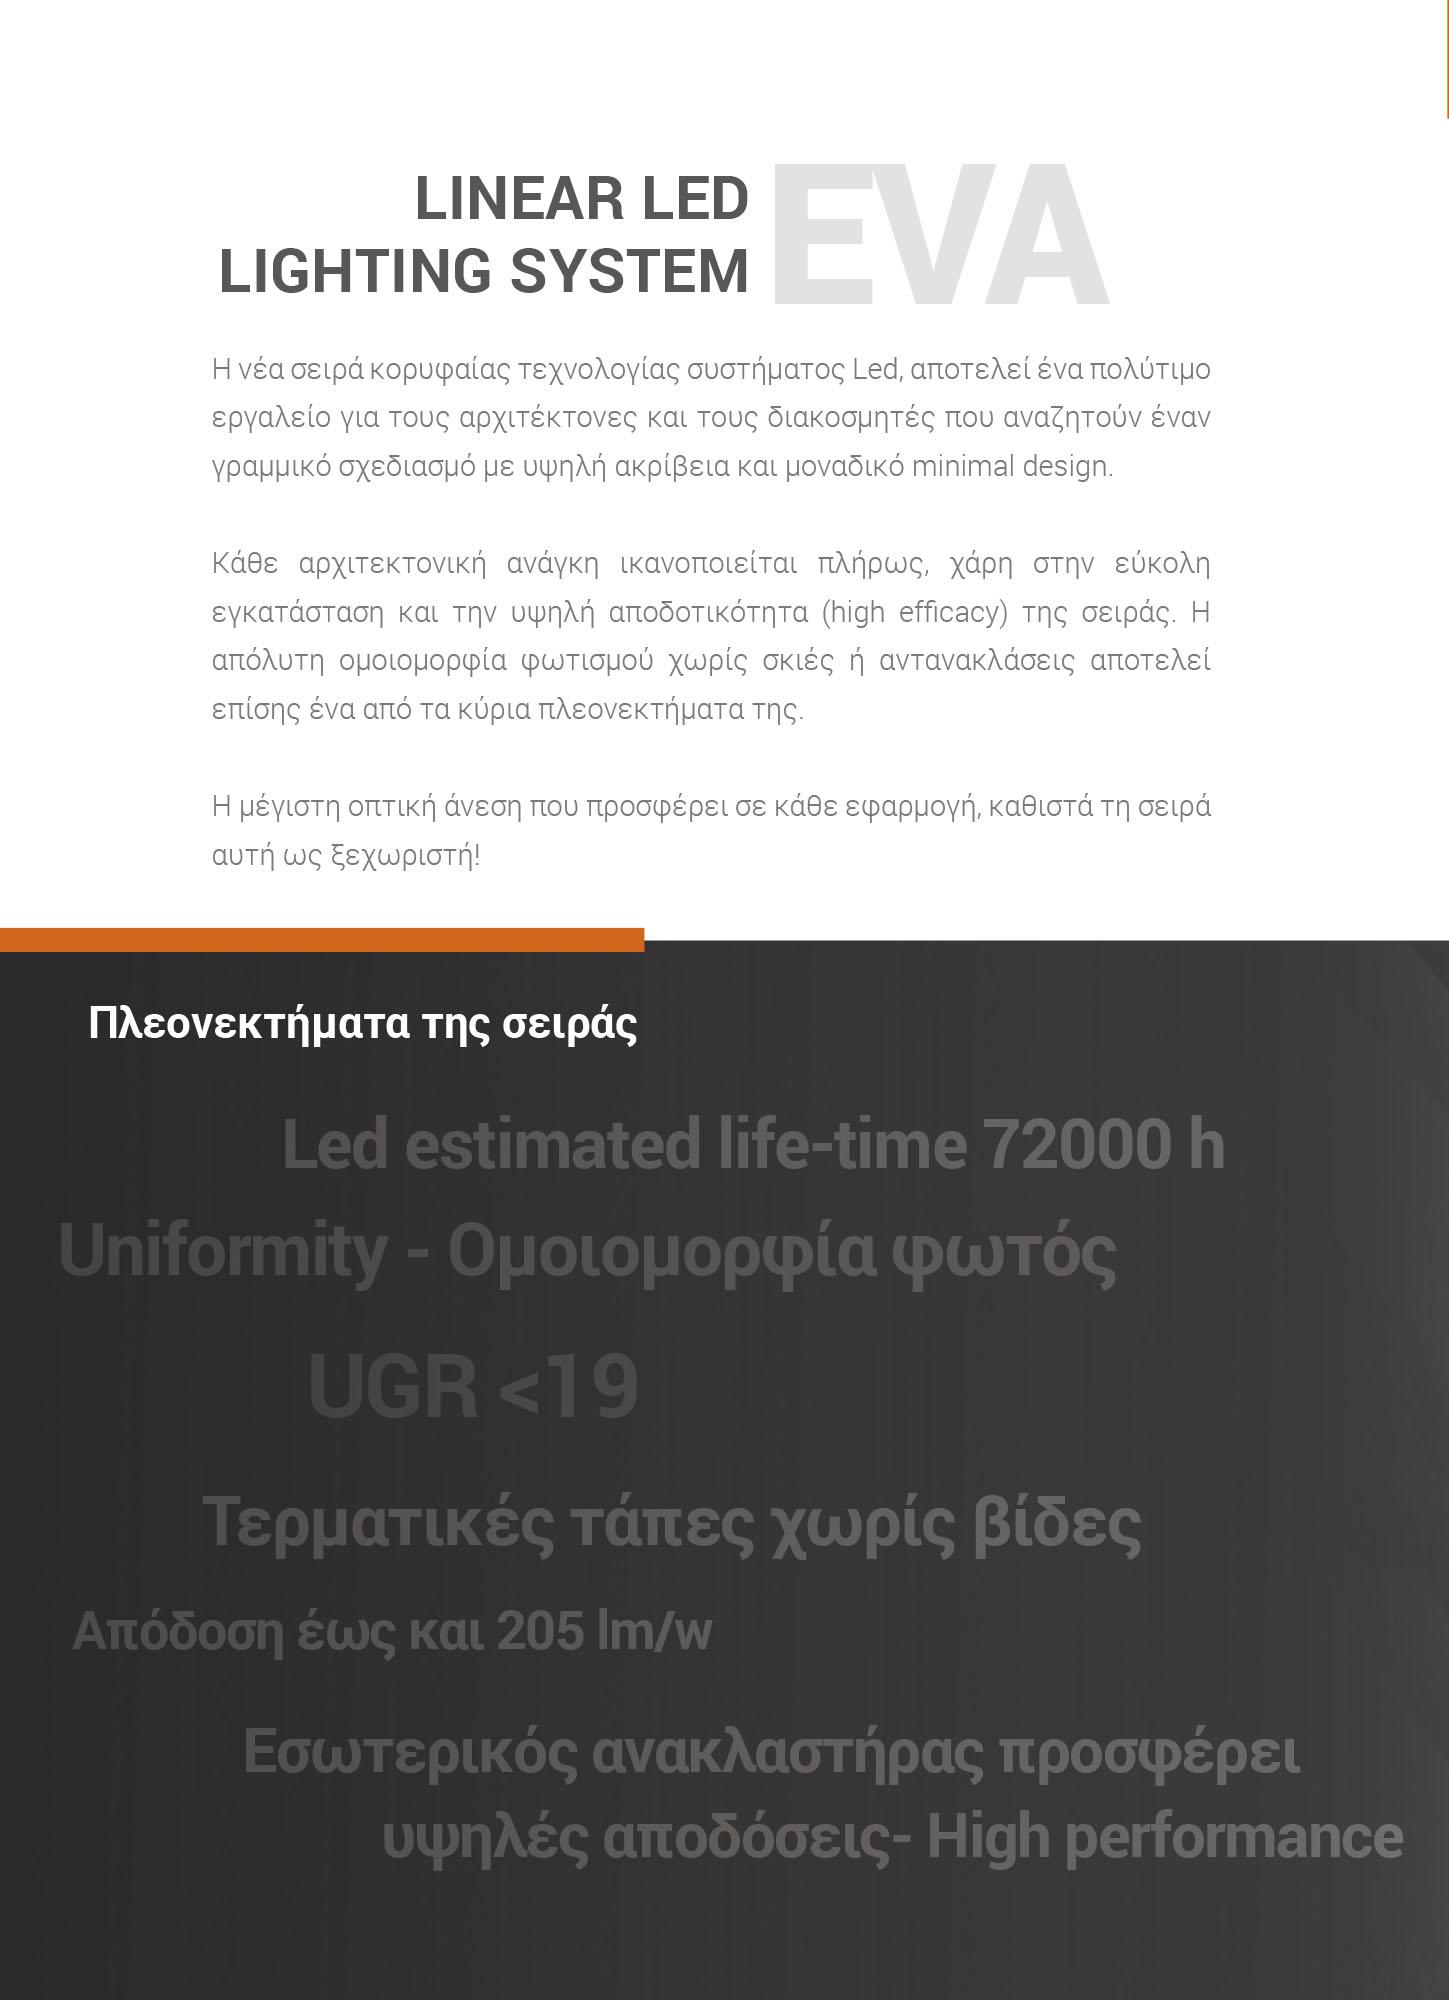 https://www.jib.gr/wp-content/uploads/2021/10/EVA-28sel-print-2.jpg